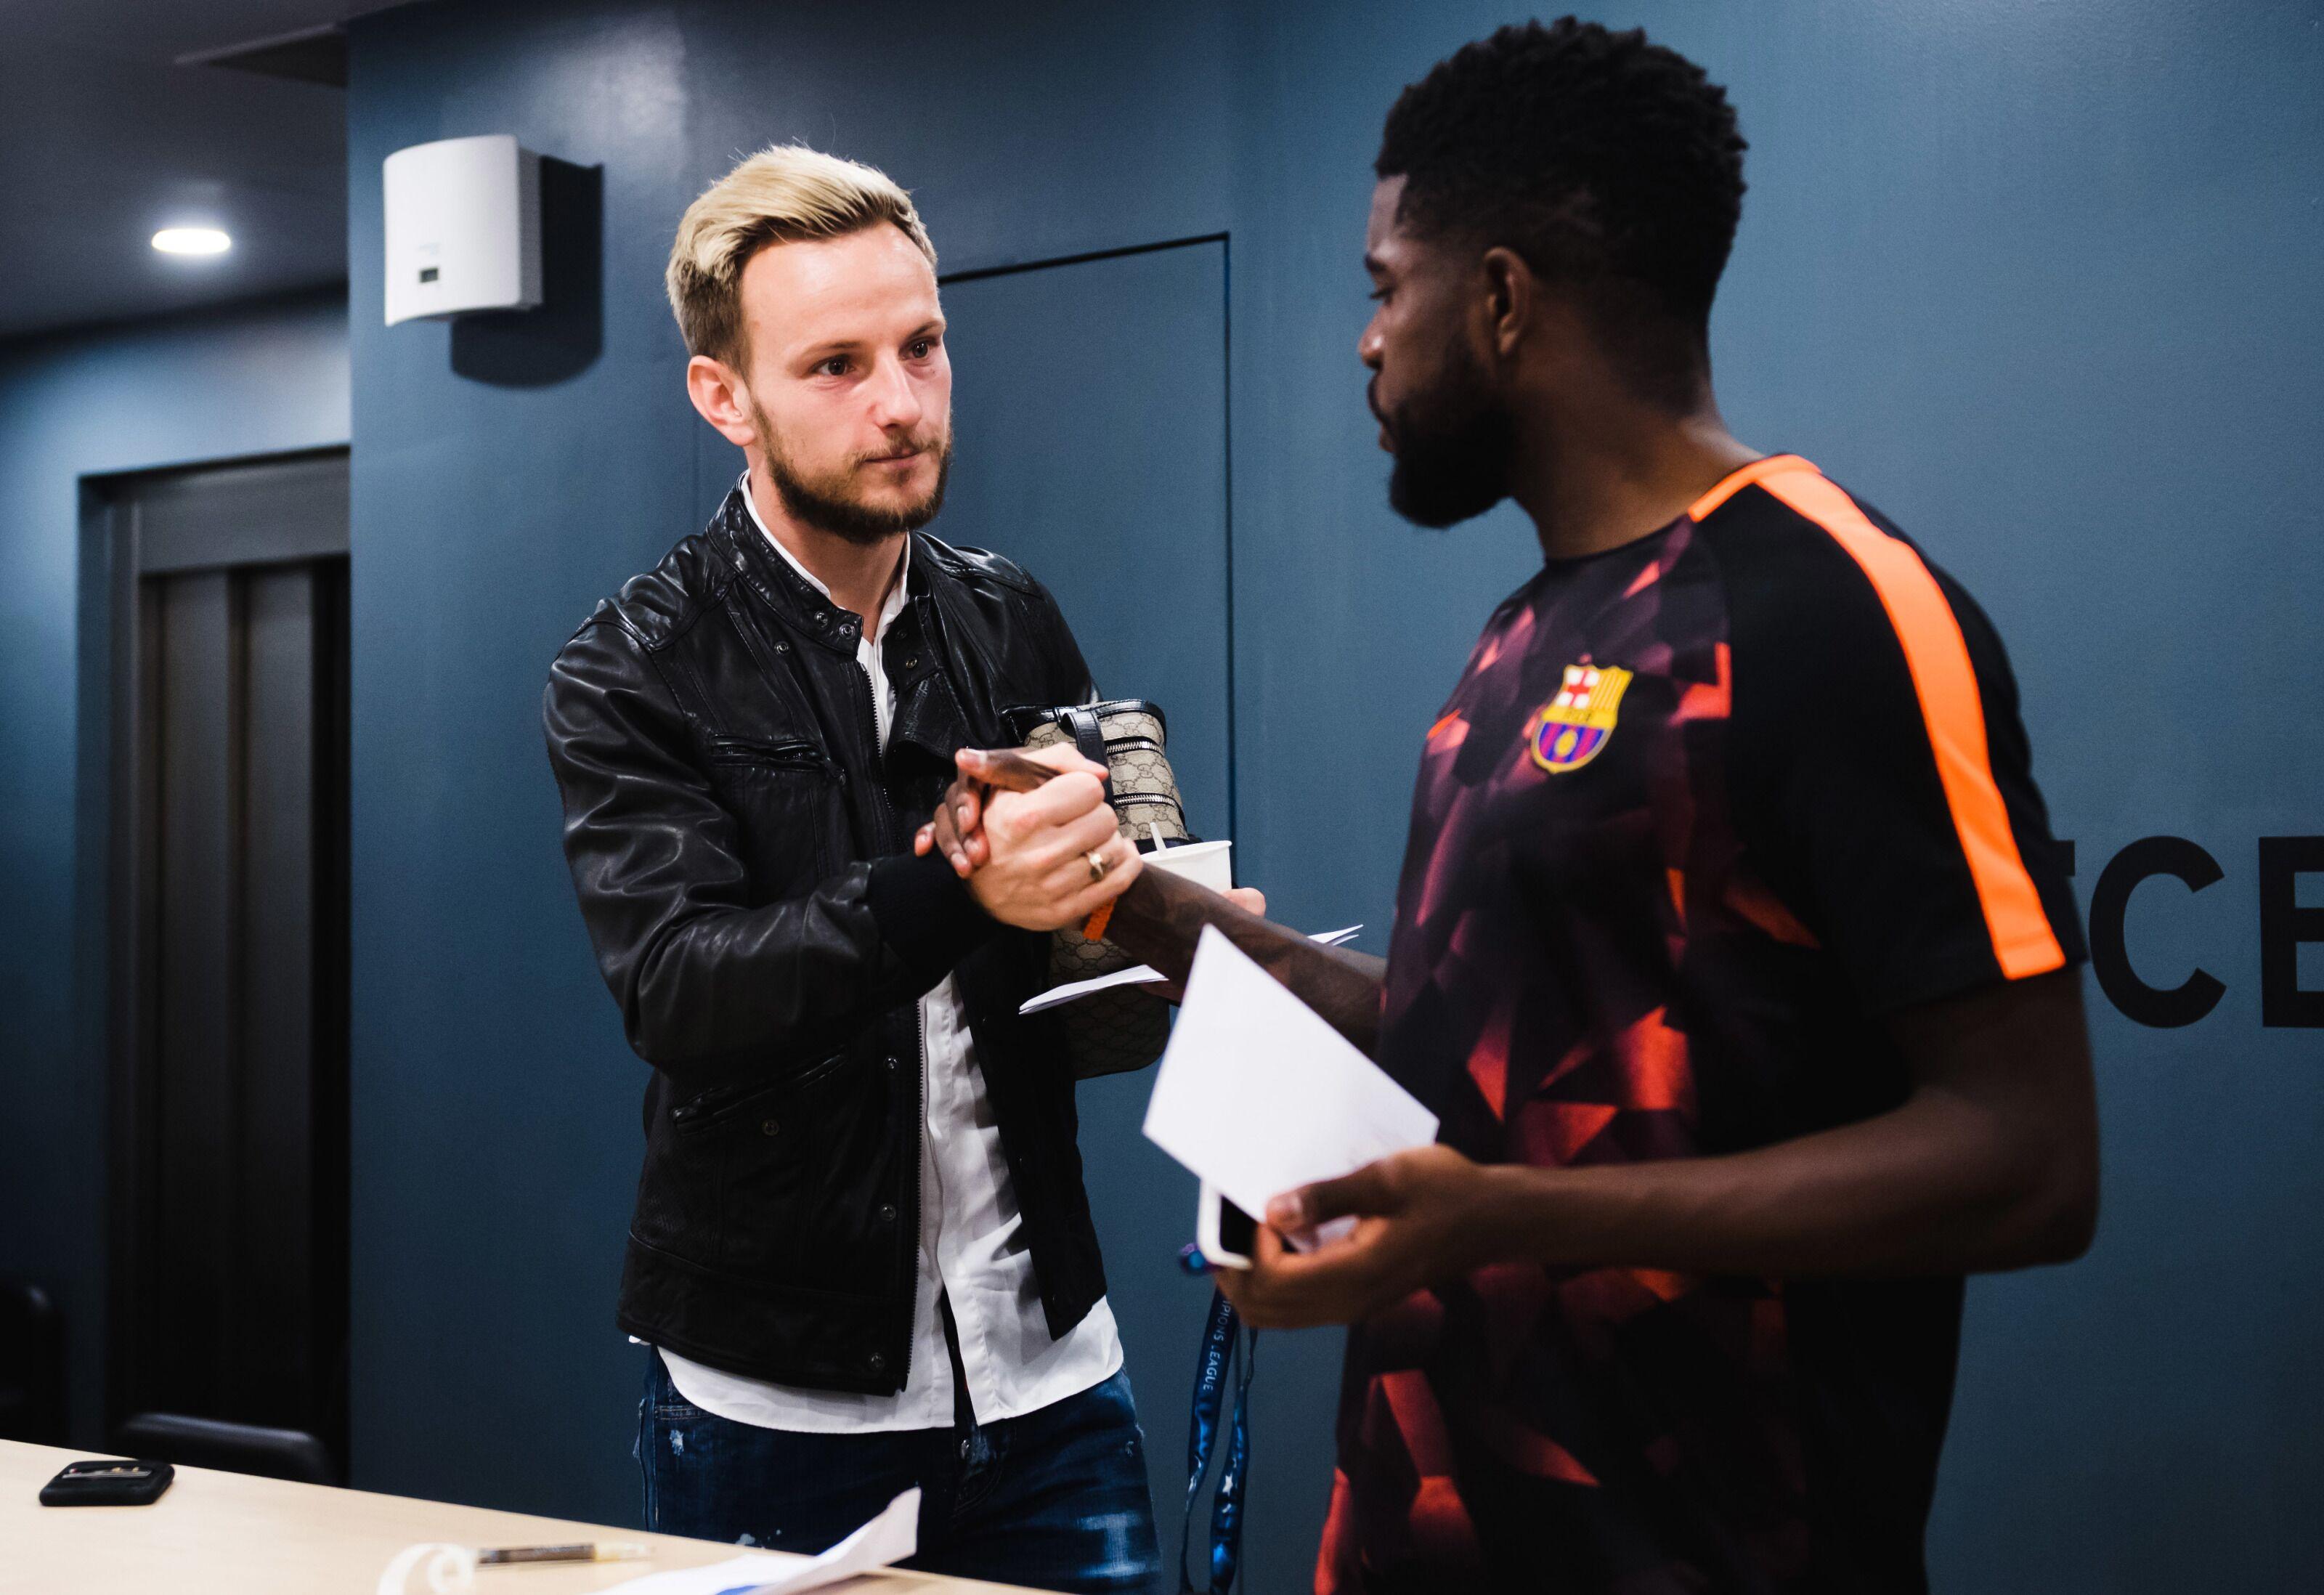 European giants bid to land Barcelona superstar in January